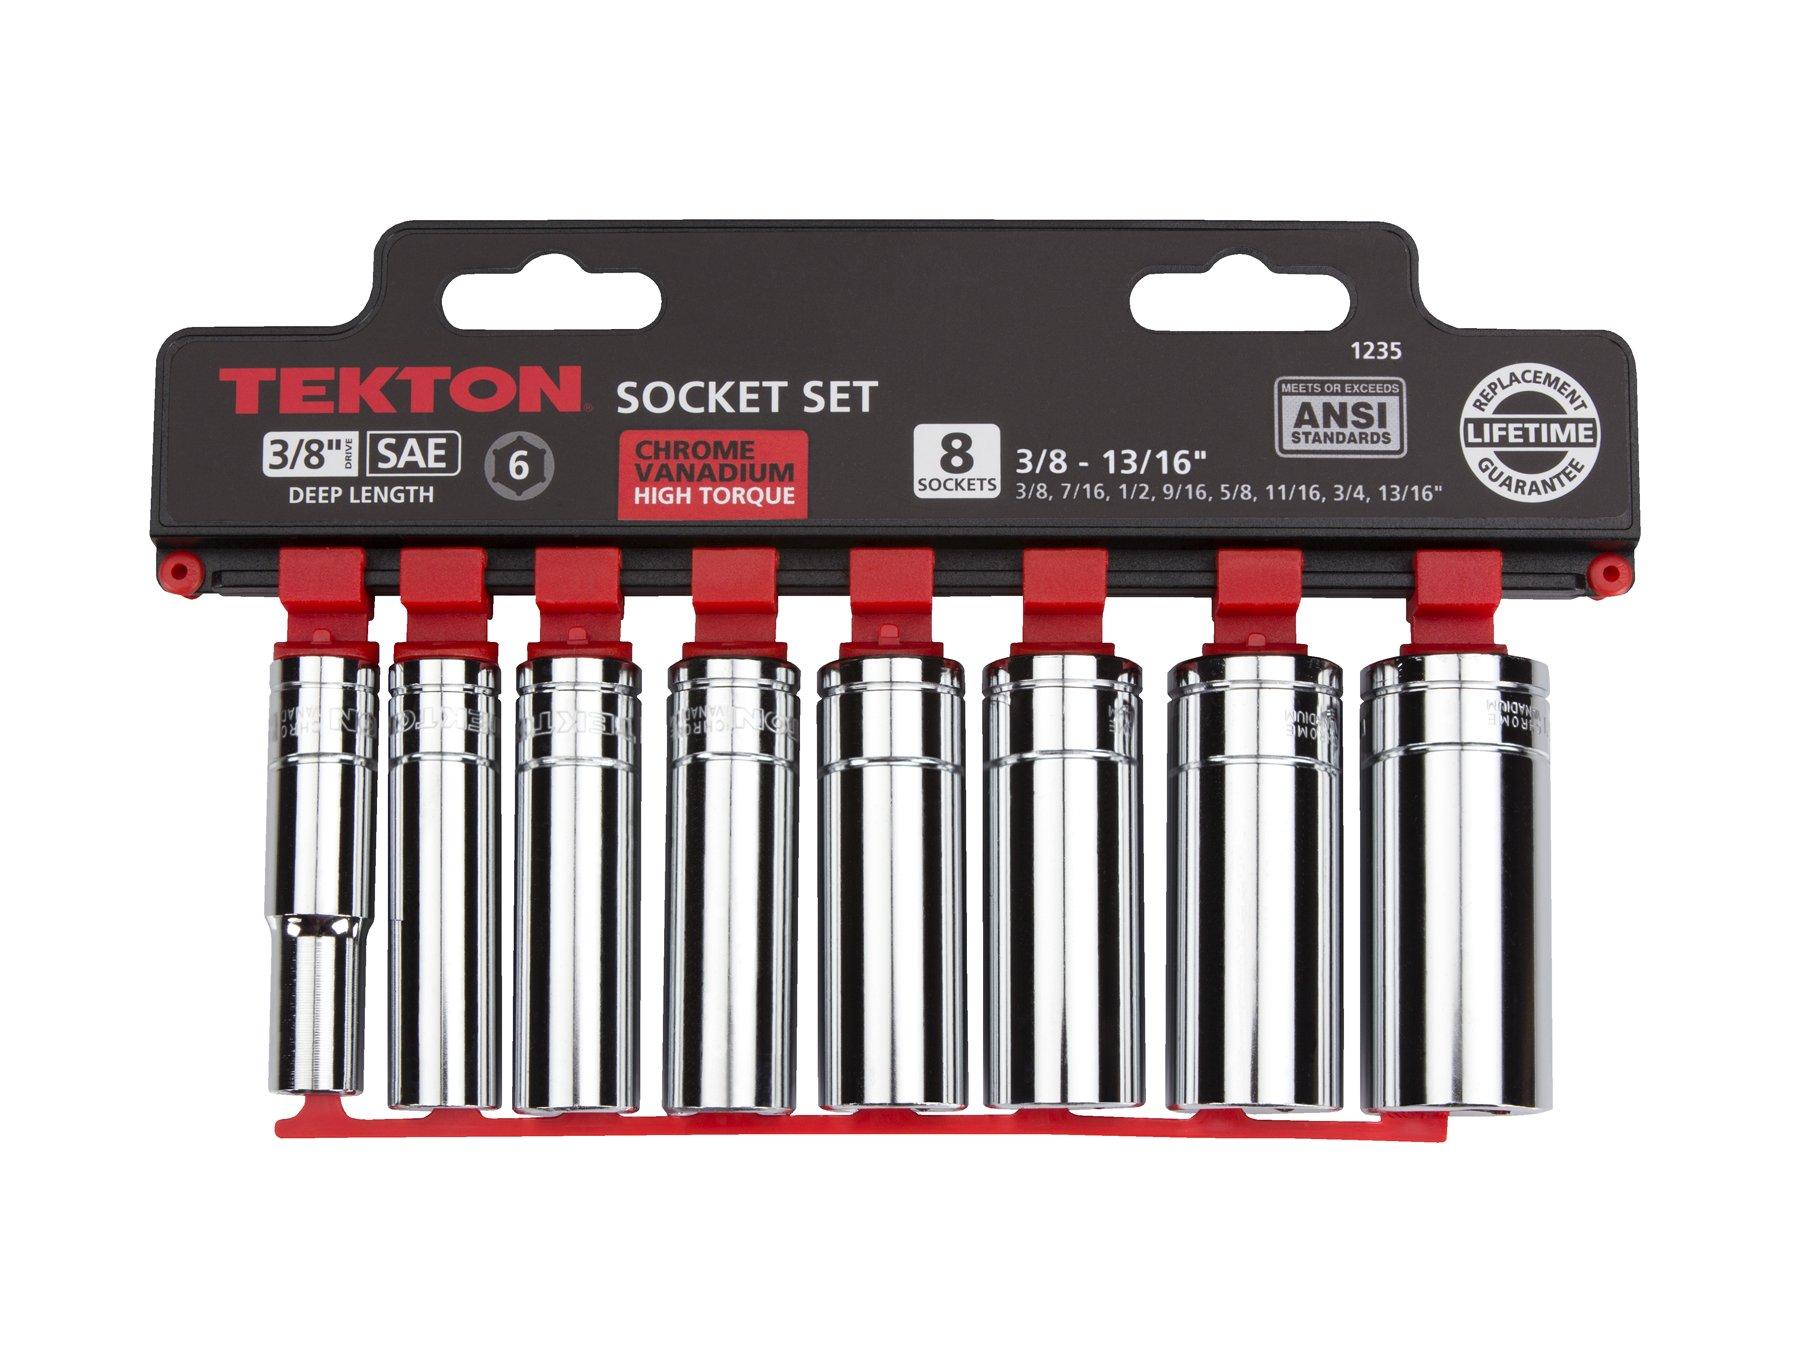 TEKTON 3/8-Inch Drive Deep Socket Set, Inch, Cr-V, 3/8-Inch - 13/16-Inch, 8-Sockets | 1235